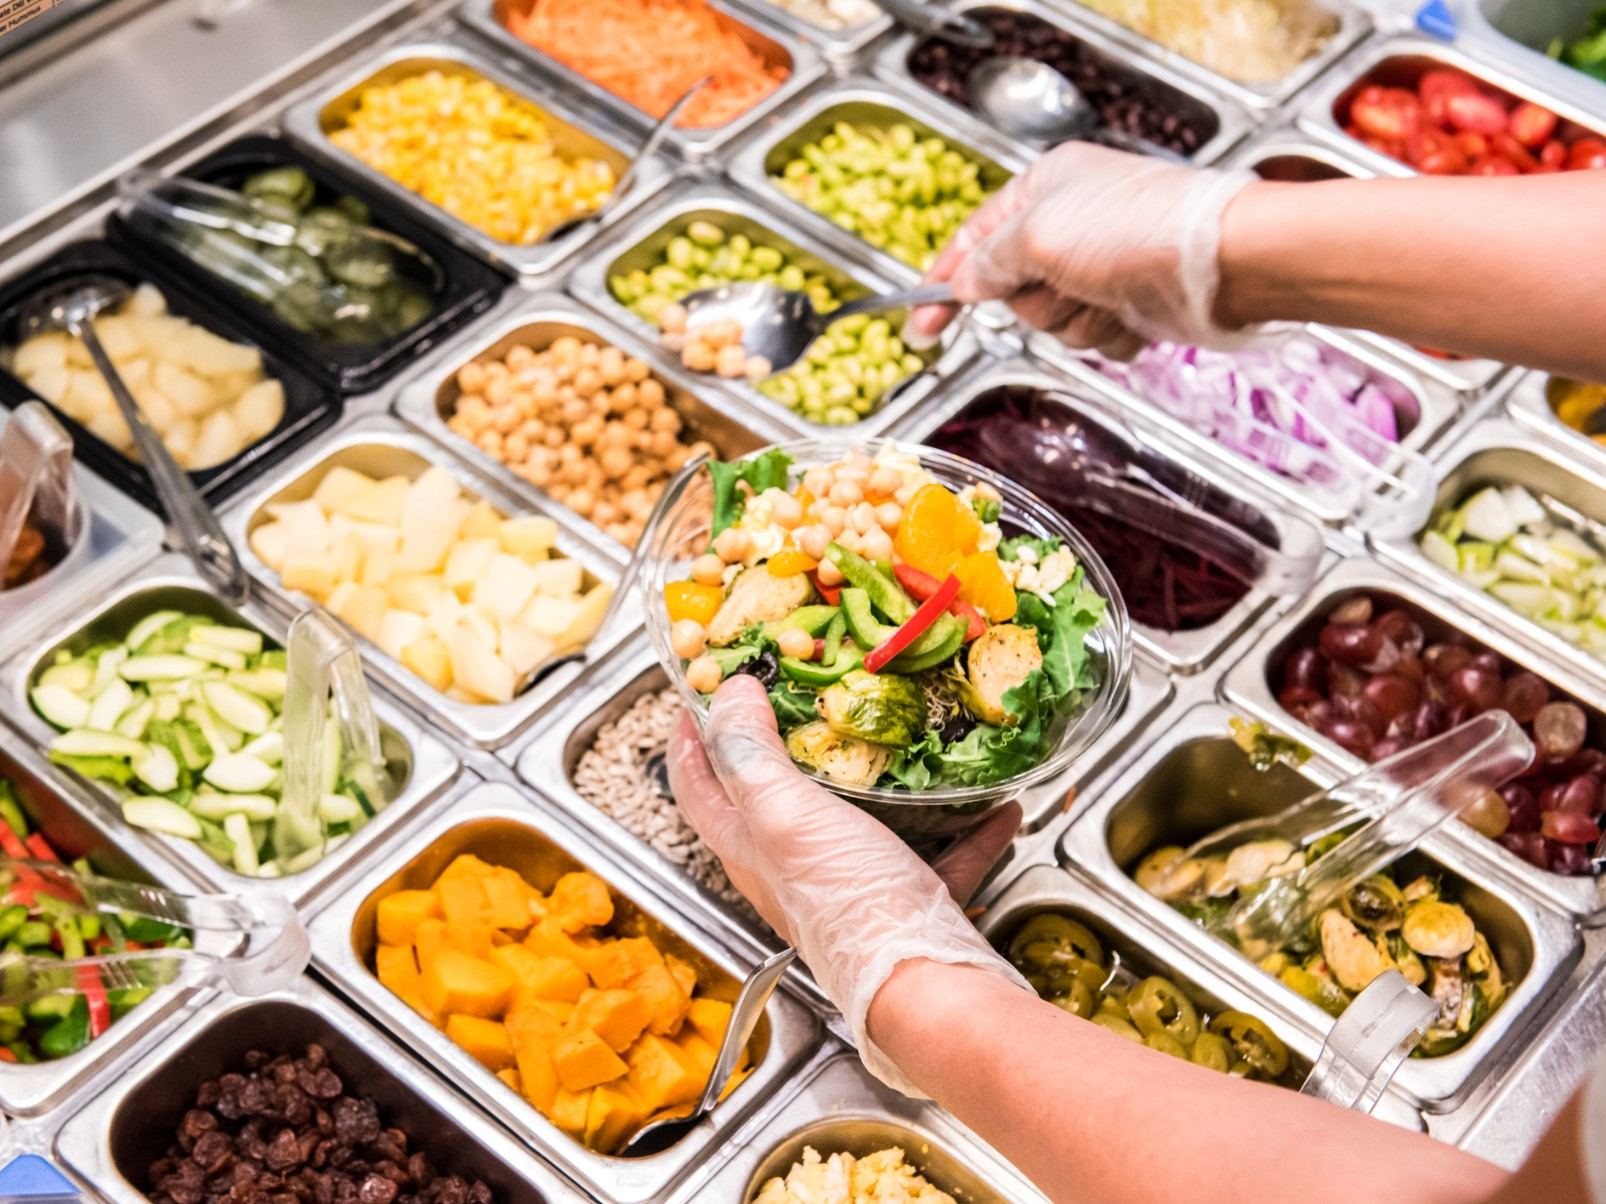 SaladStop! (Capital Tower) - Dine, Shop, Earn